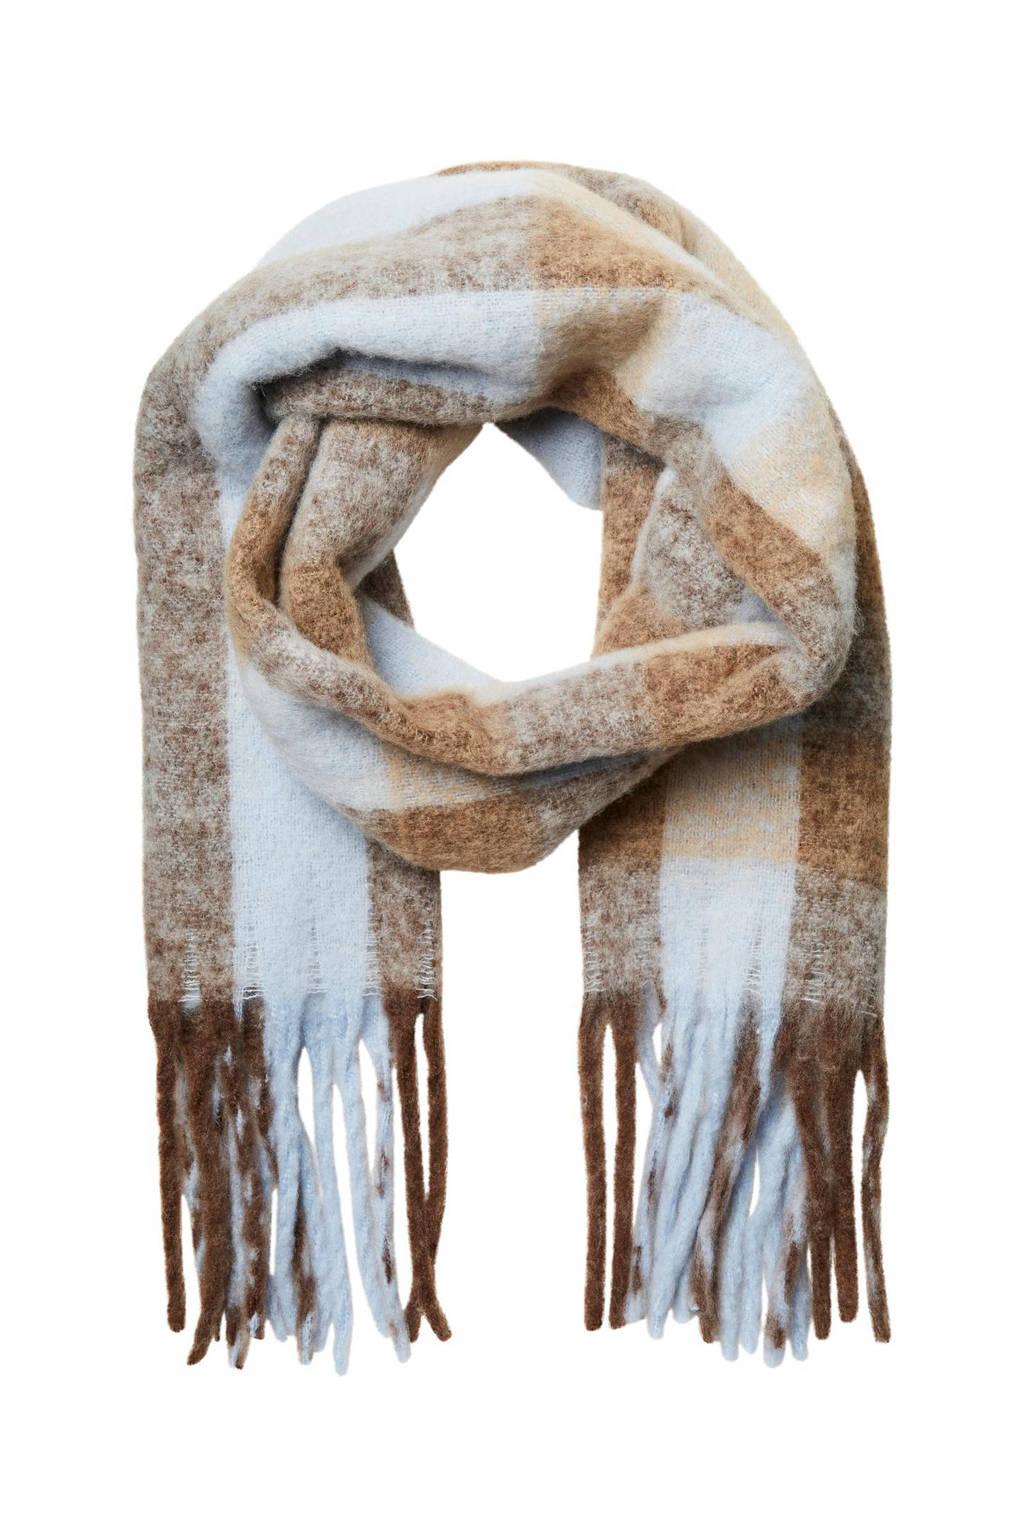 SELECTED FEMME geruite sjaal SLFTALLY lichtblauw/bruin, Lichtblauw/bruin